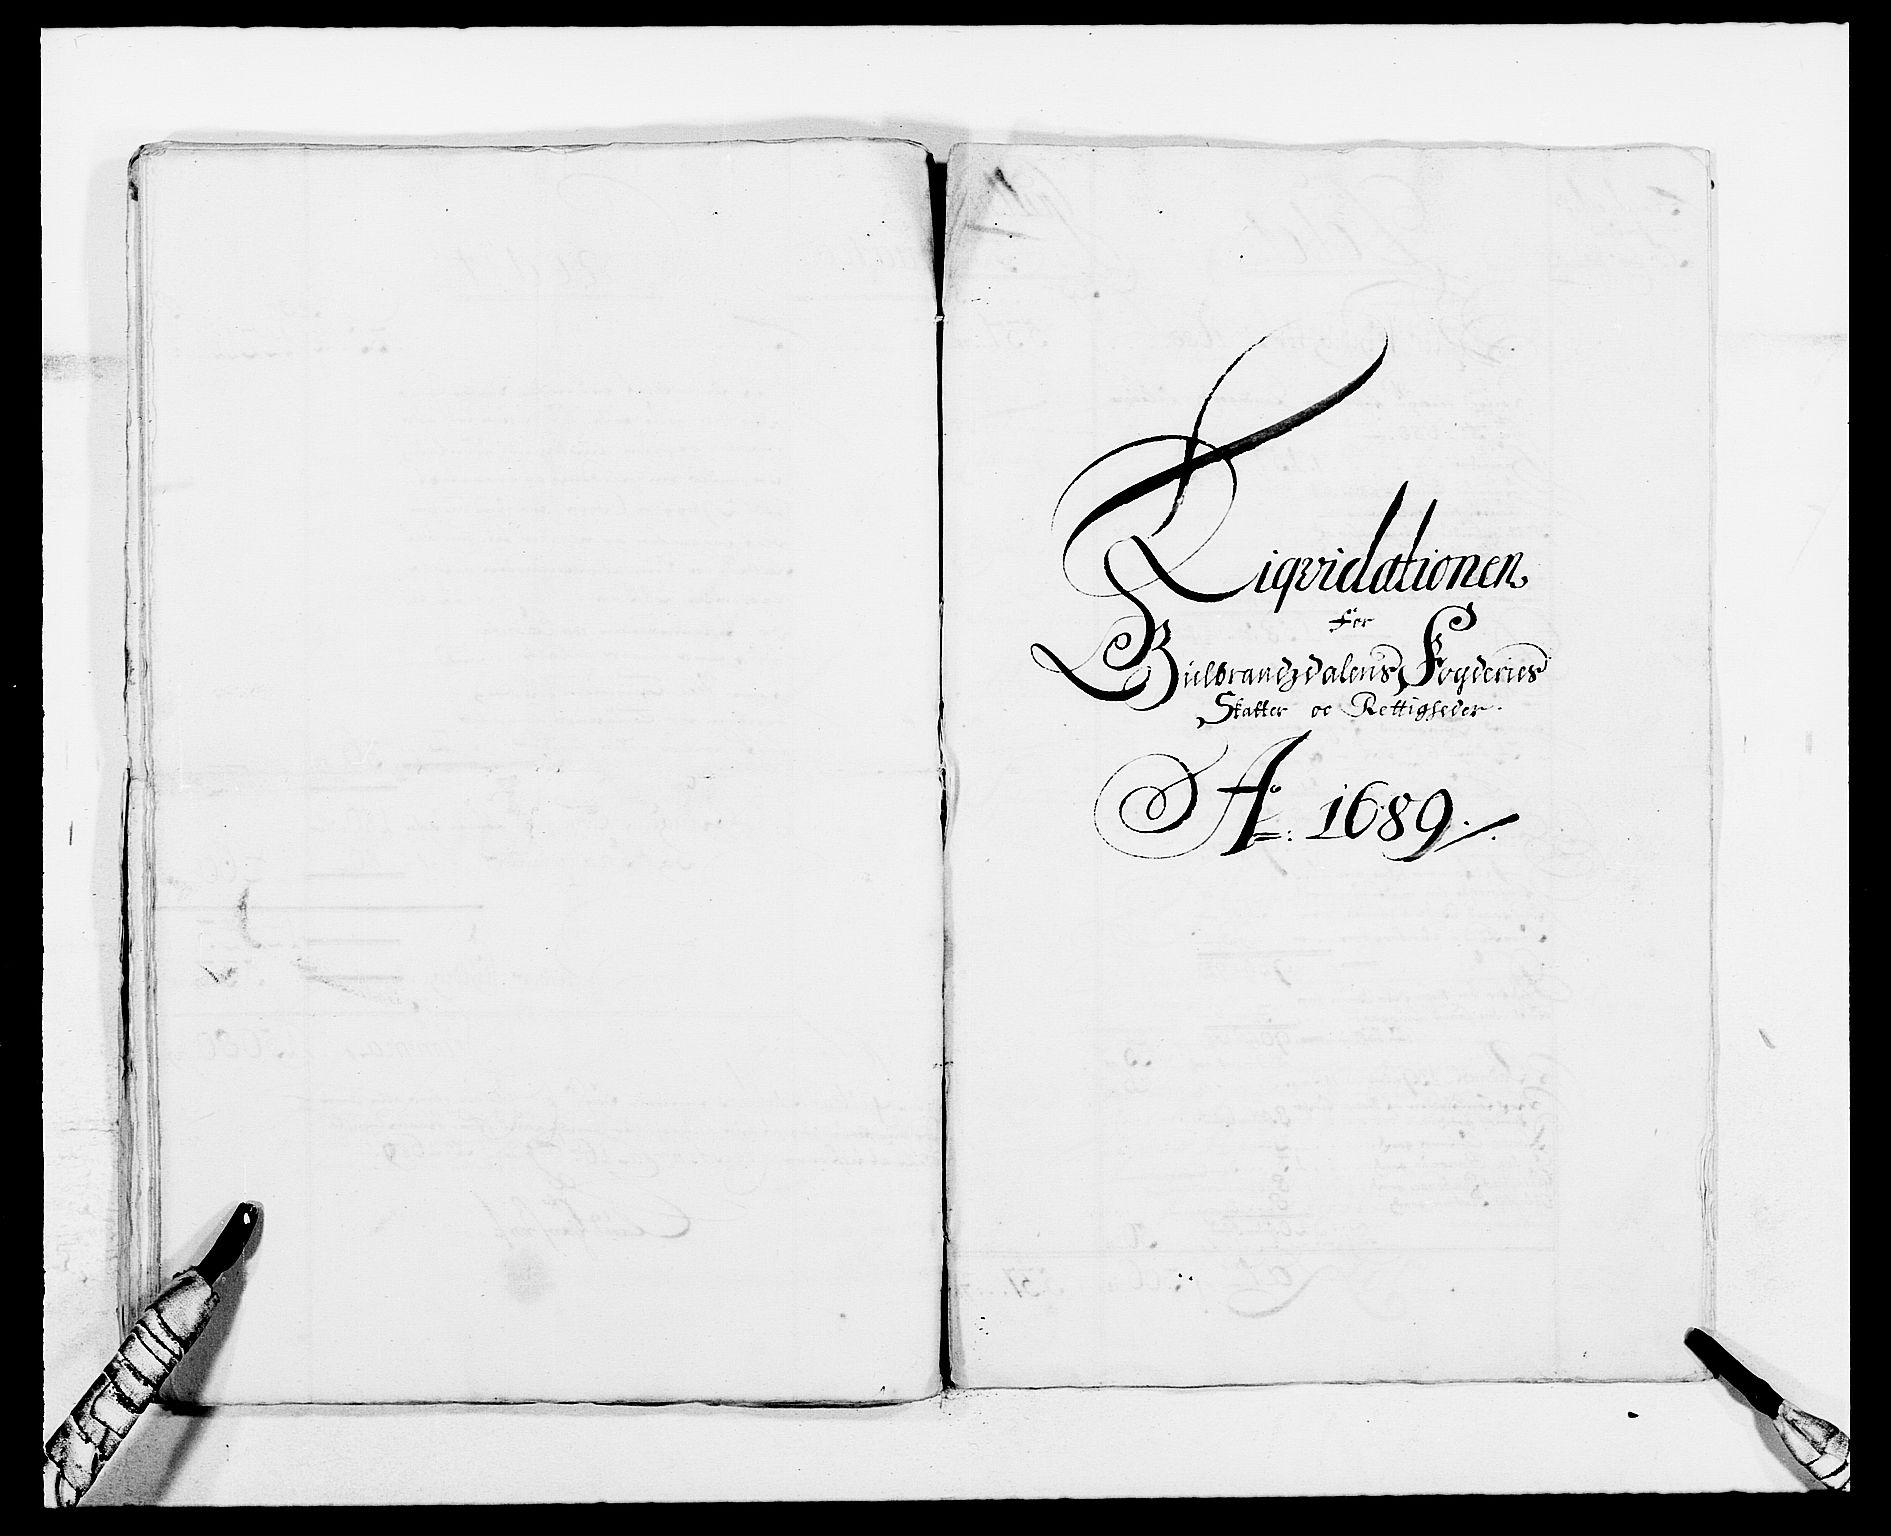 RA, Rentekammeret inntil 1814, Reviderte regnskaper, Fogderegnskap, R17/L1157: Fogderegnskap Gudbrandsdal, 1682-1689, s. 36